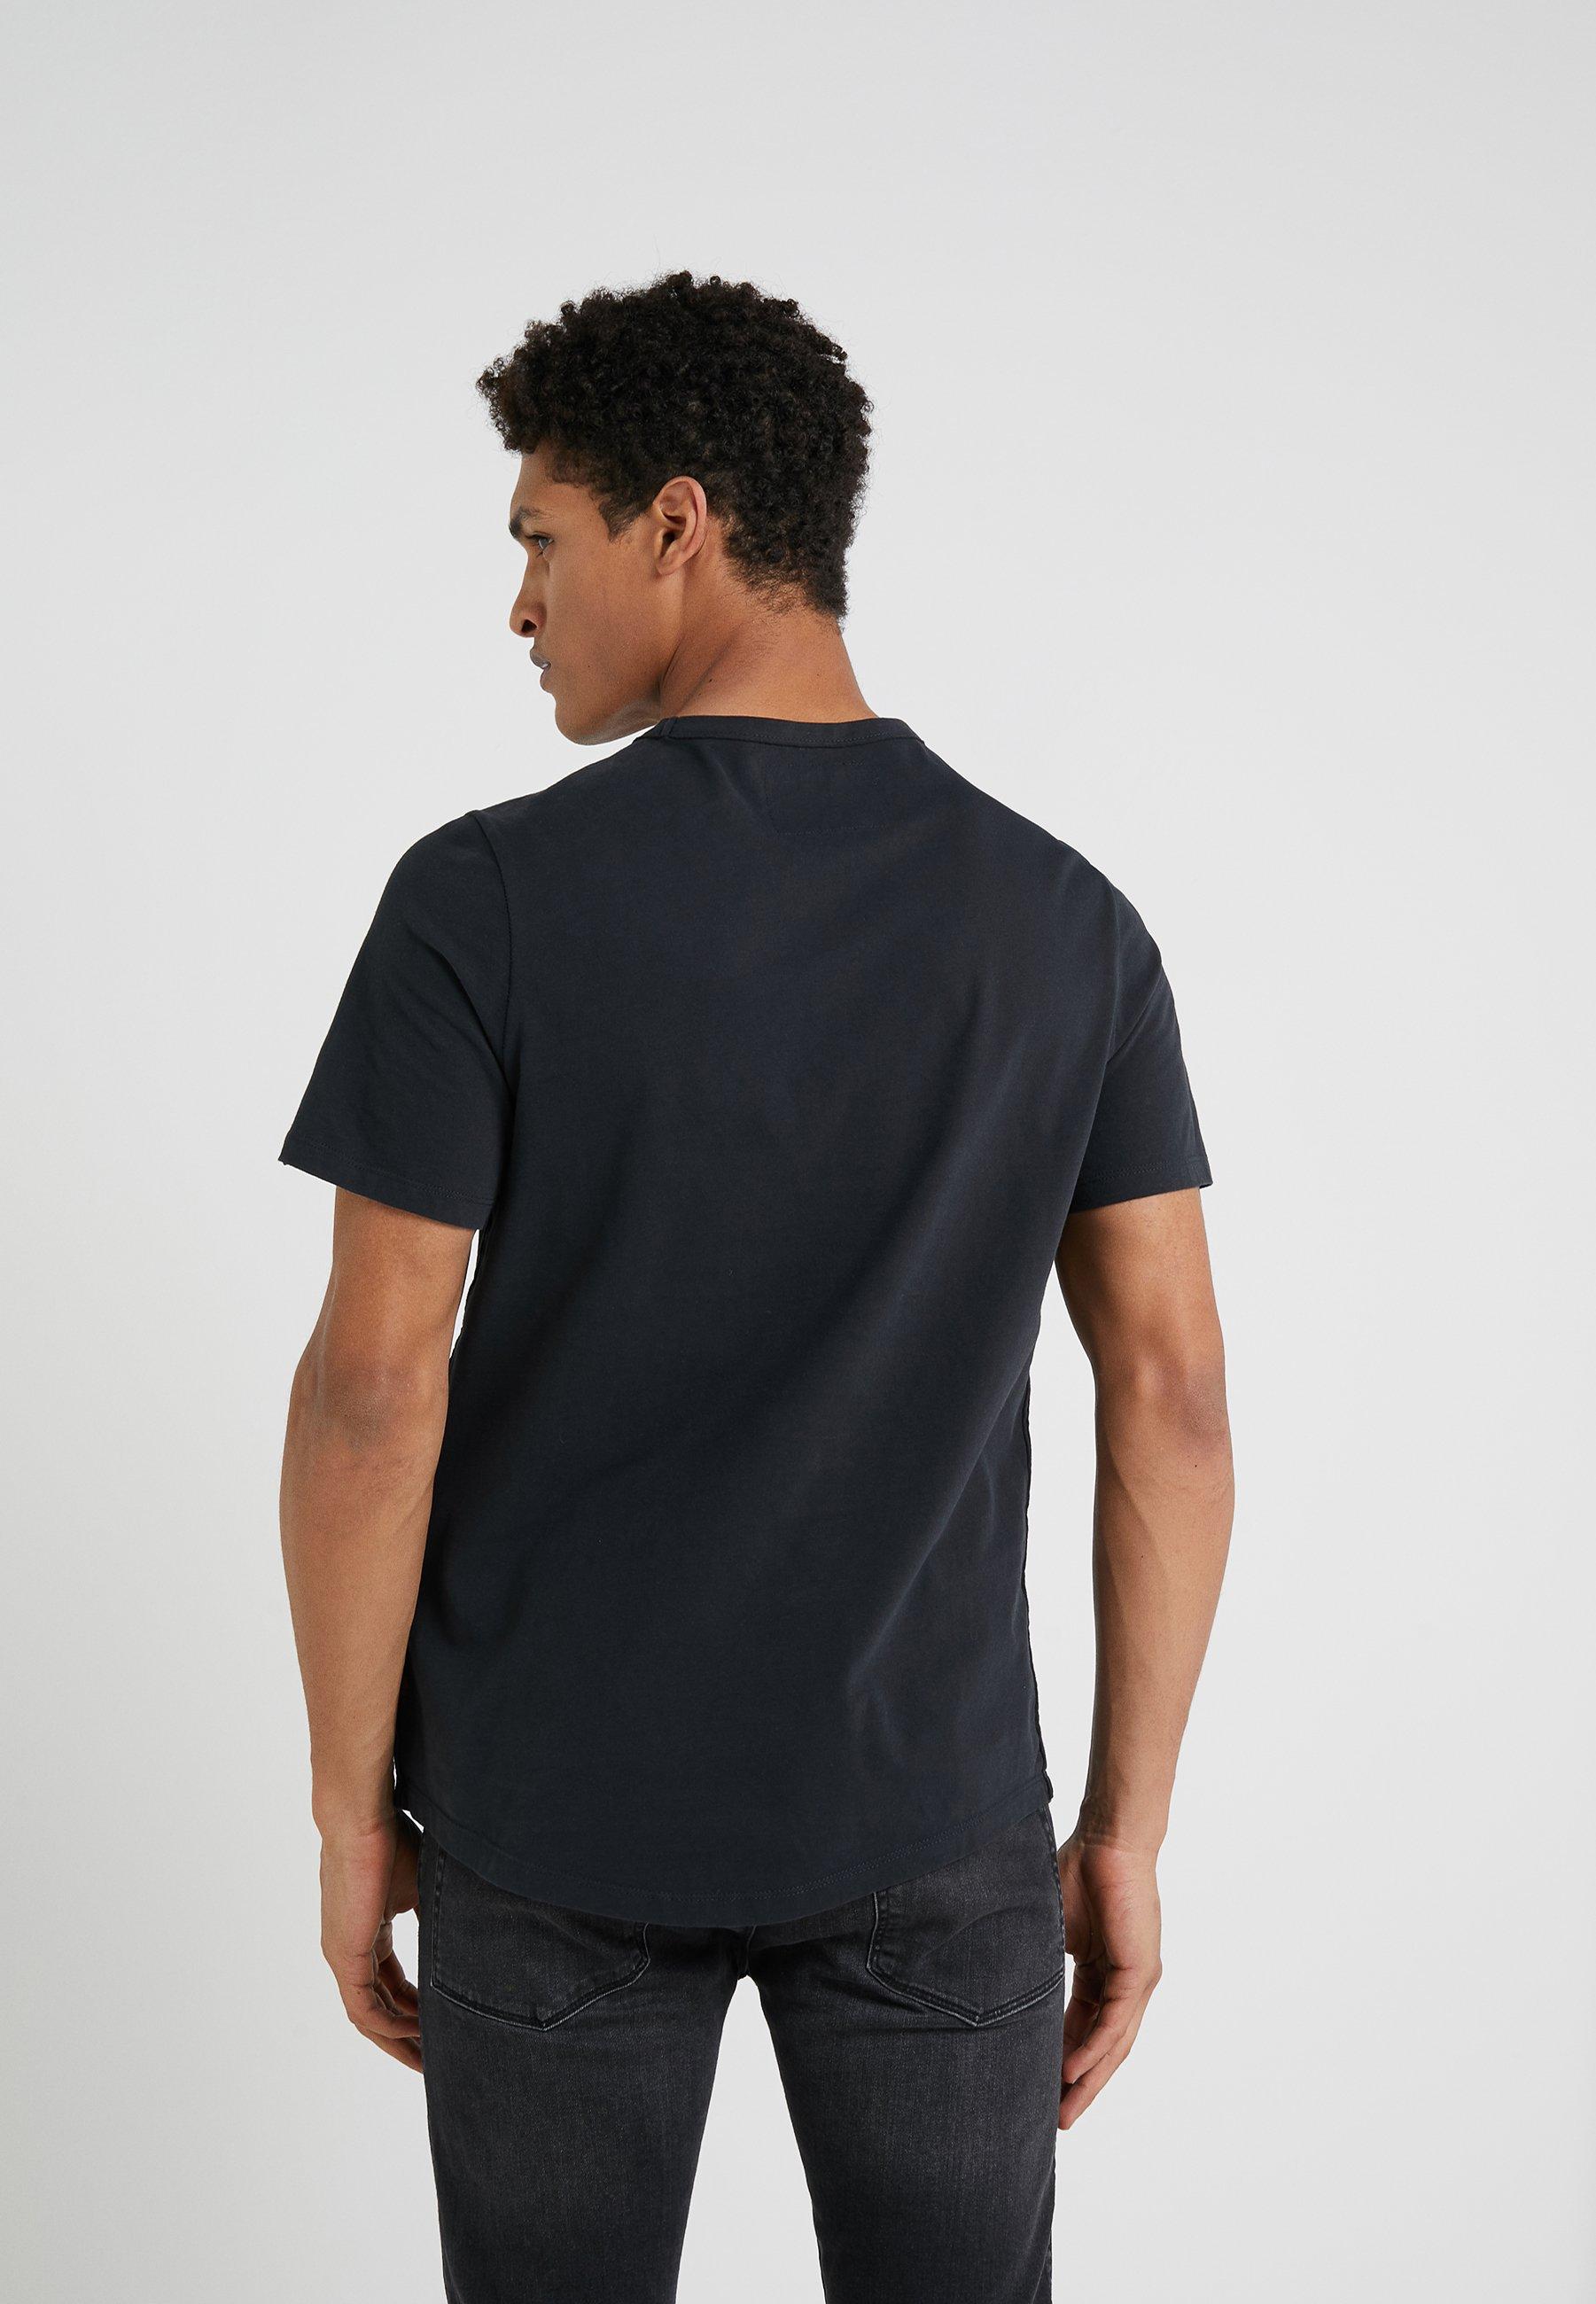 True LogosT Religion shirt Imprimé Black I7bYf6gyv